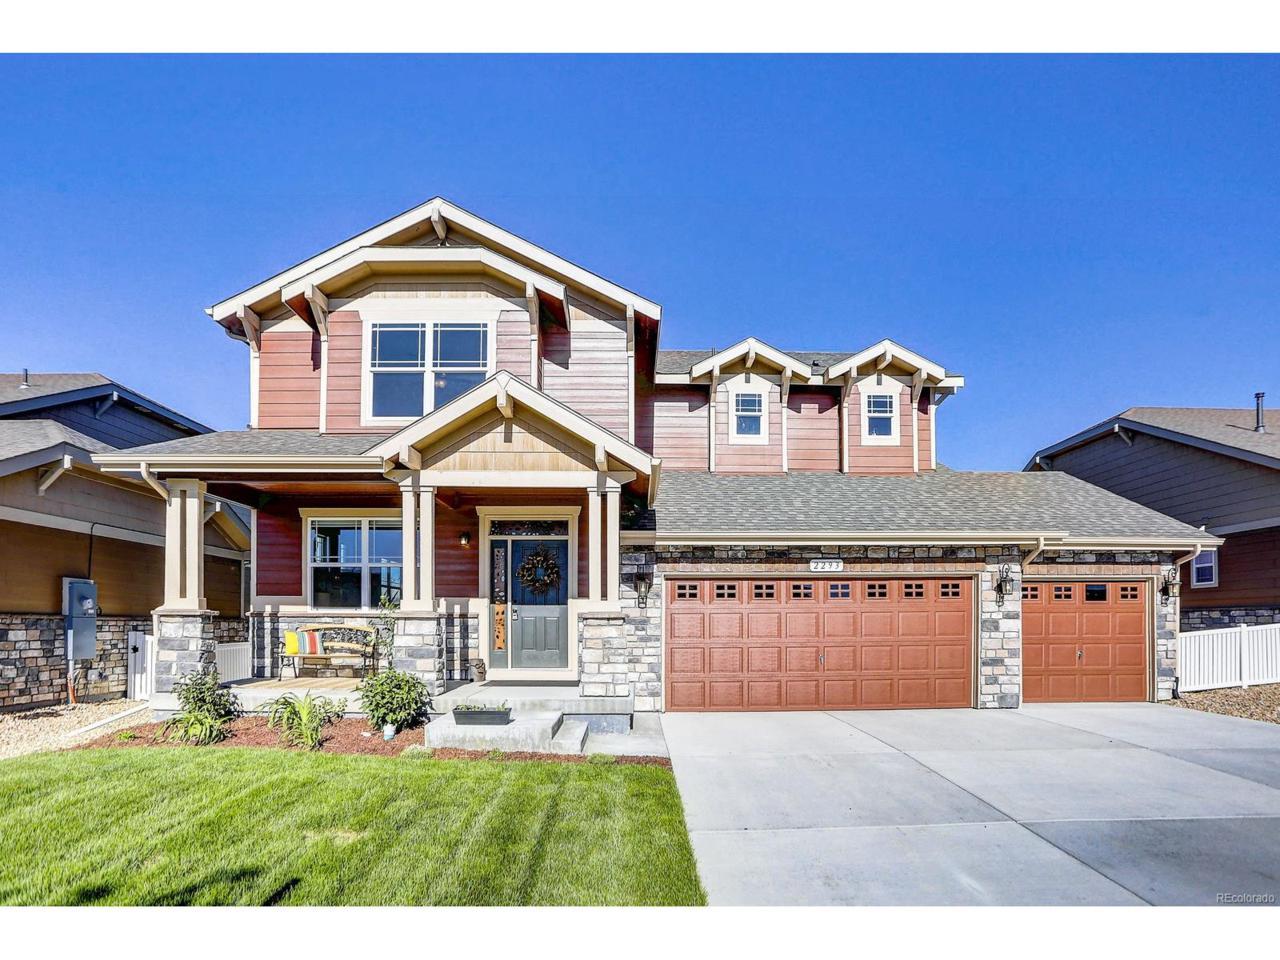 2293 Winding Drive, Longmont, CO 80504 (MLS #3369390) :: 8z Real Estate